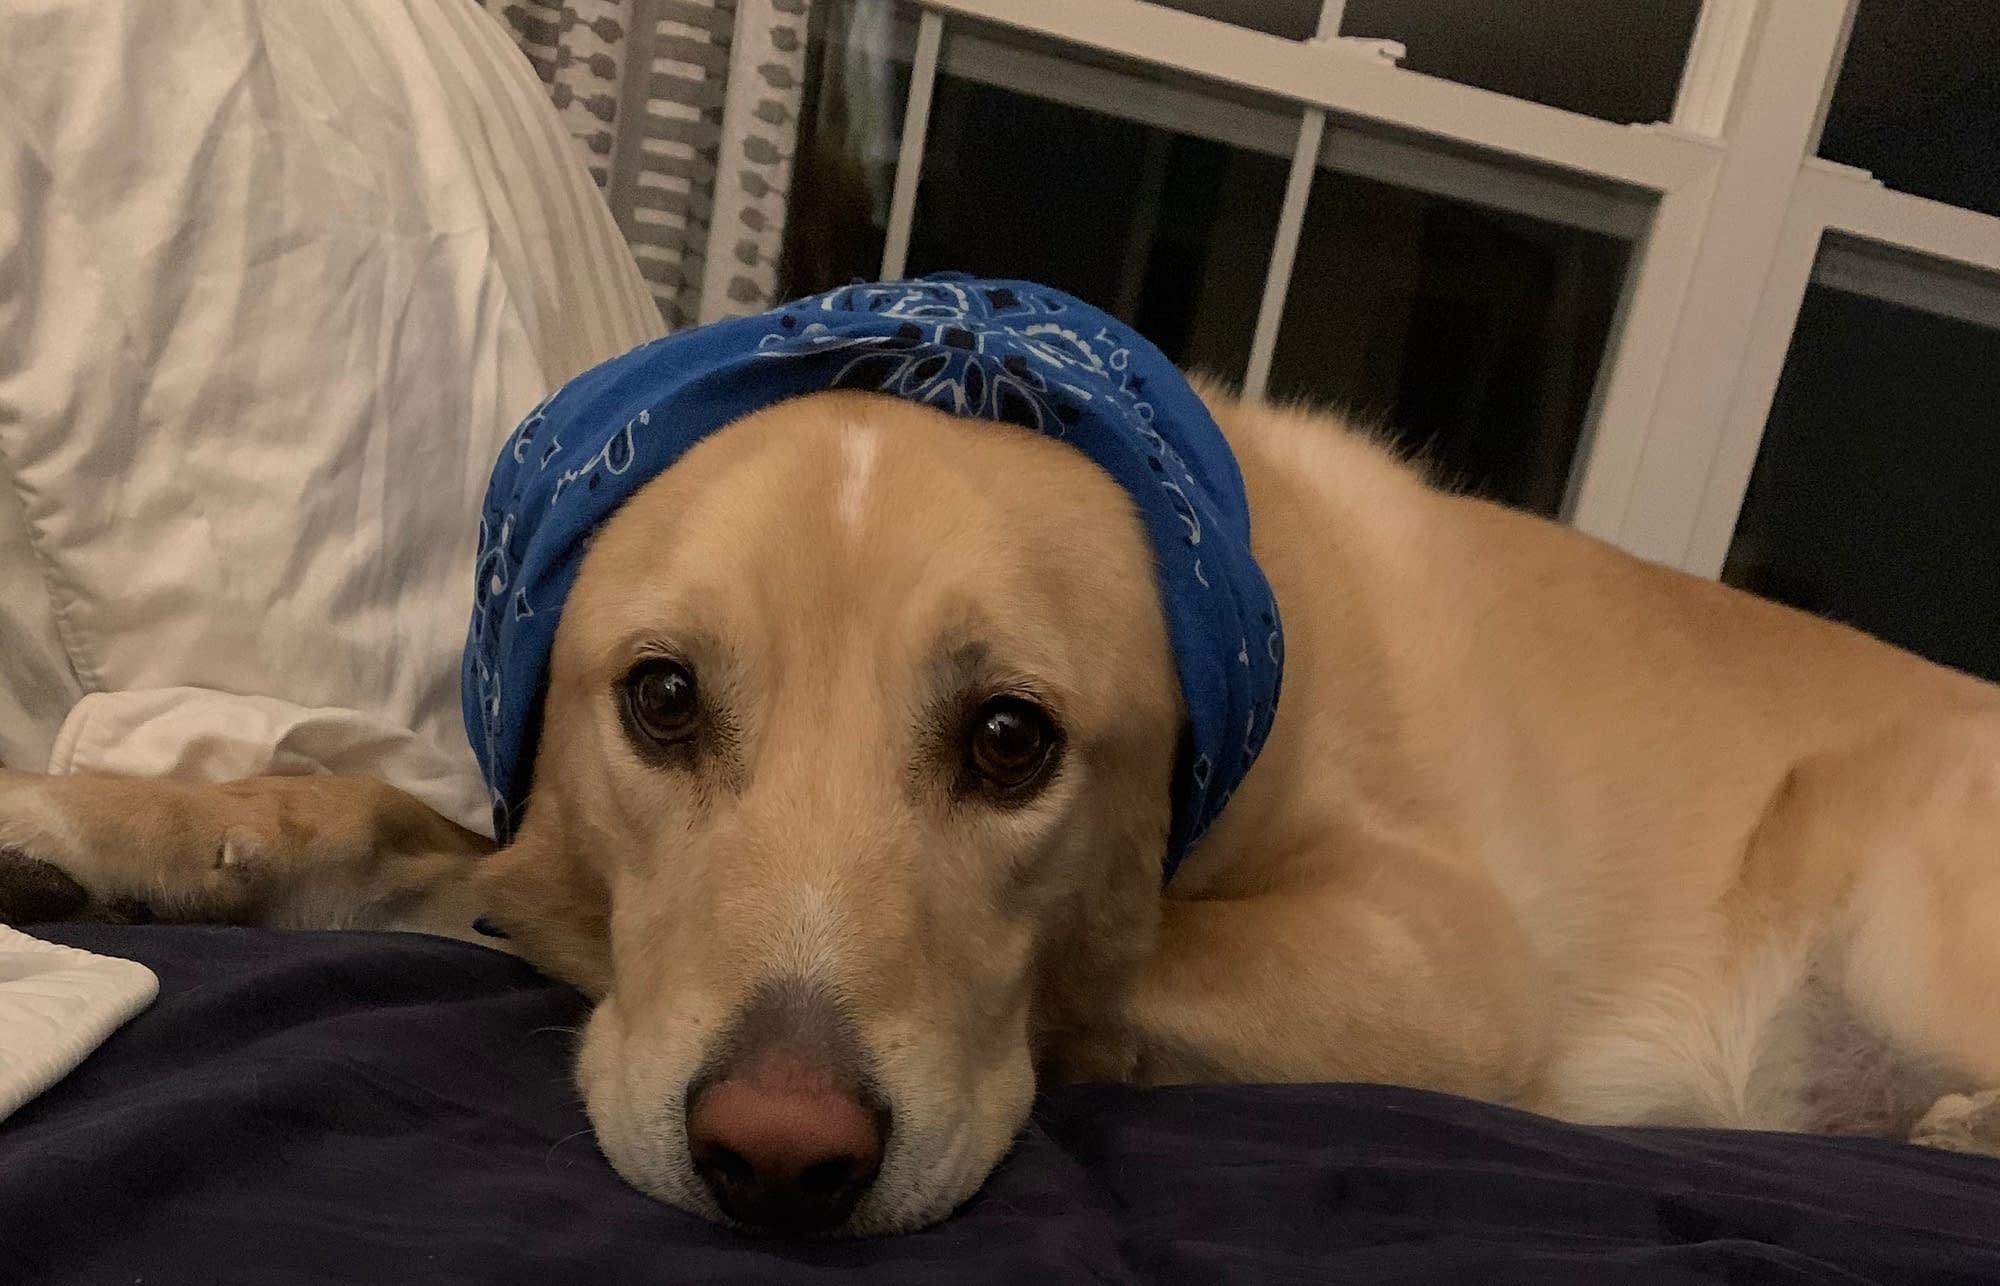 Dog wearing a bandana on it's head.